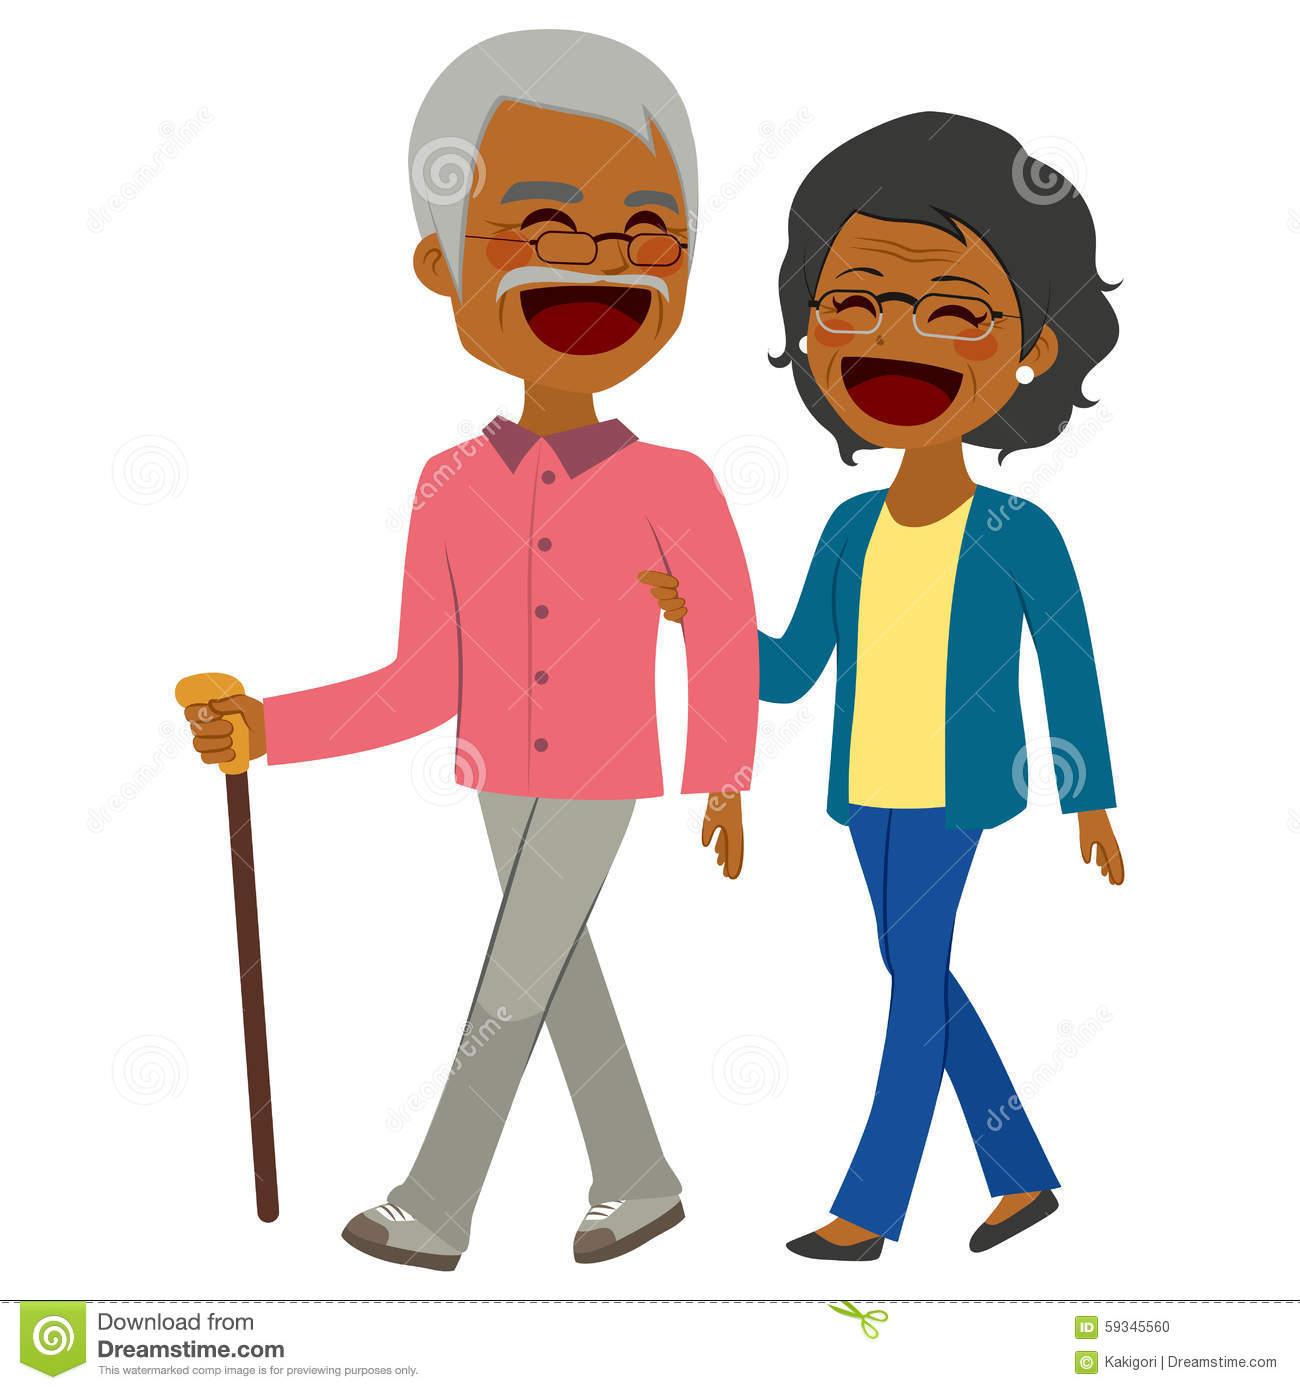 Phillipines clipart senior citizen #11